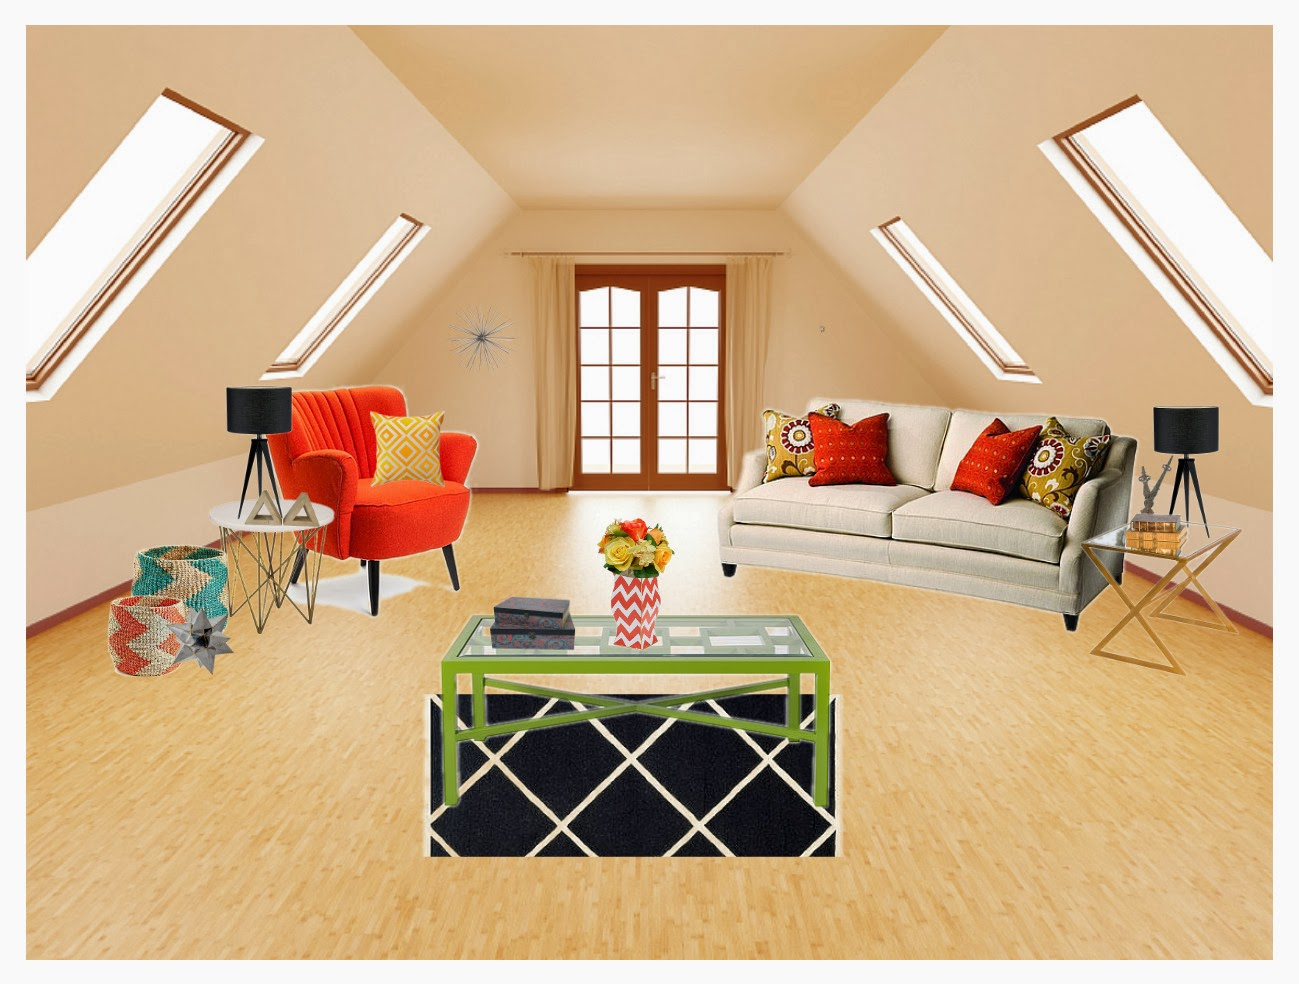 Debbie Pula Interior Design: Elements of Line